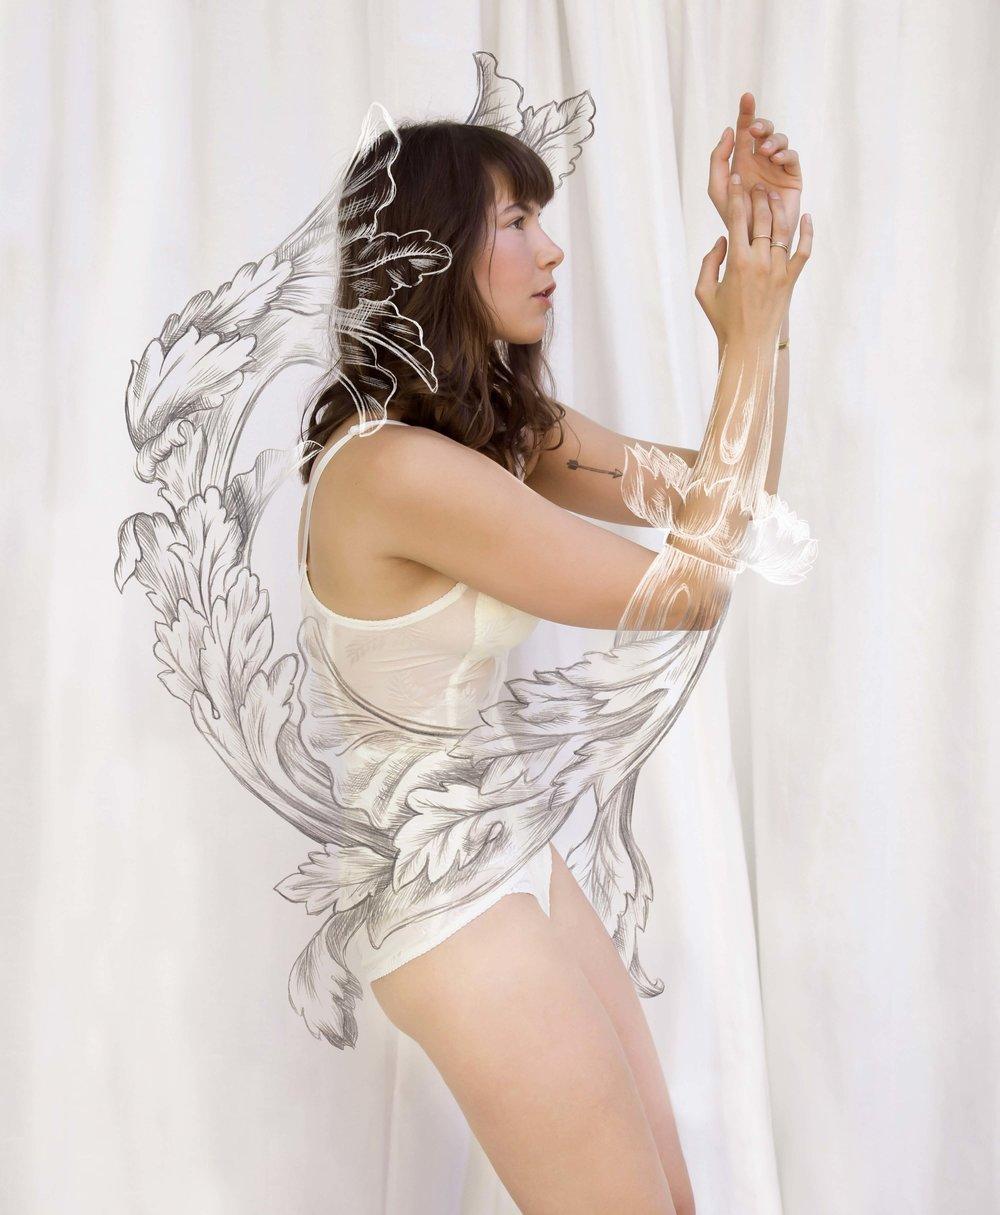 Marie-de-Beaucourt-illustration-x-Tina-Dubrovsky-fashion-photography-webRGB-portrait-2.jpg